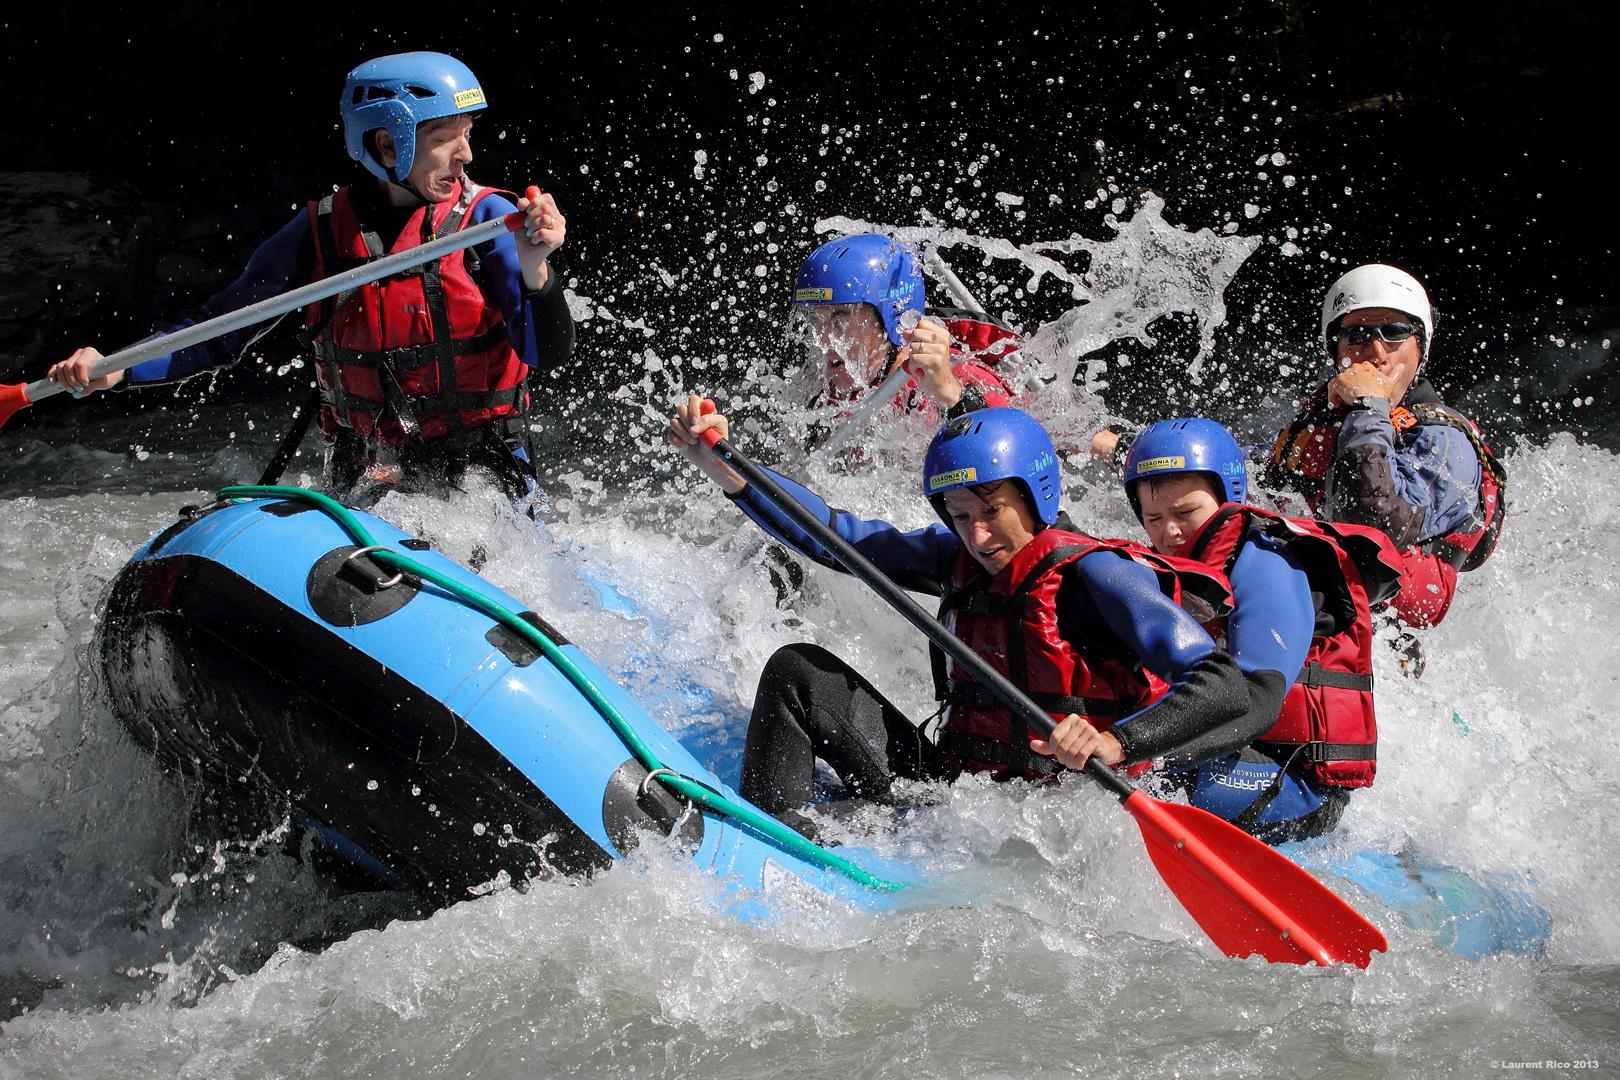 Laurent-rico-savoie-isere-photographies-videos-reportage-outdoor-groupe-riviere-descente-essaonia-rafting-eau-vive-